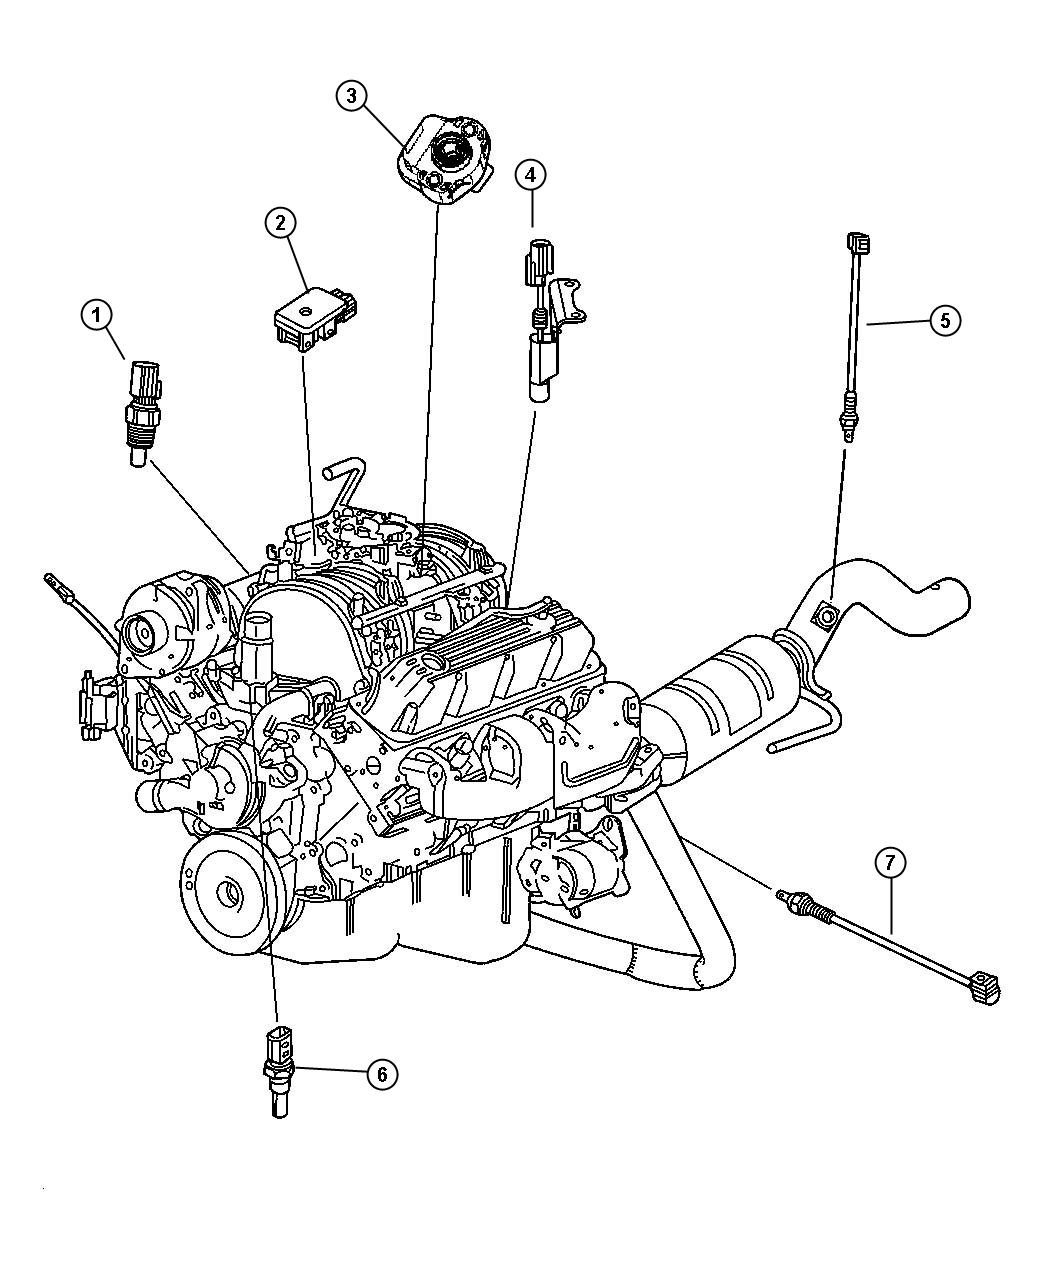 2001 dodge ram 1500 sensors engine 5 2l 5 9l